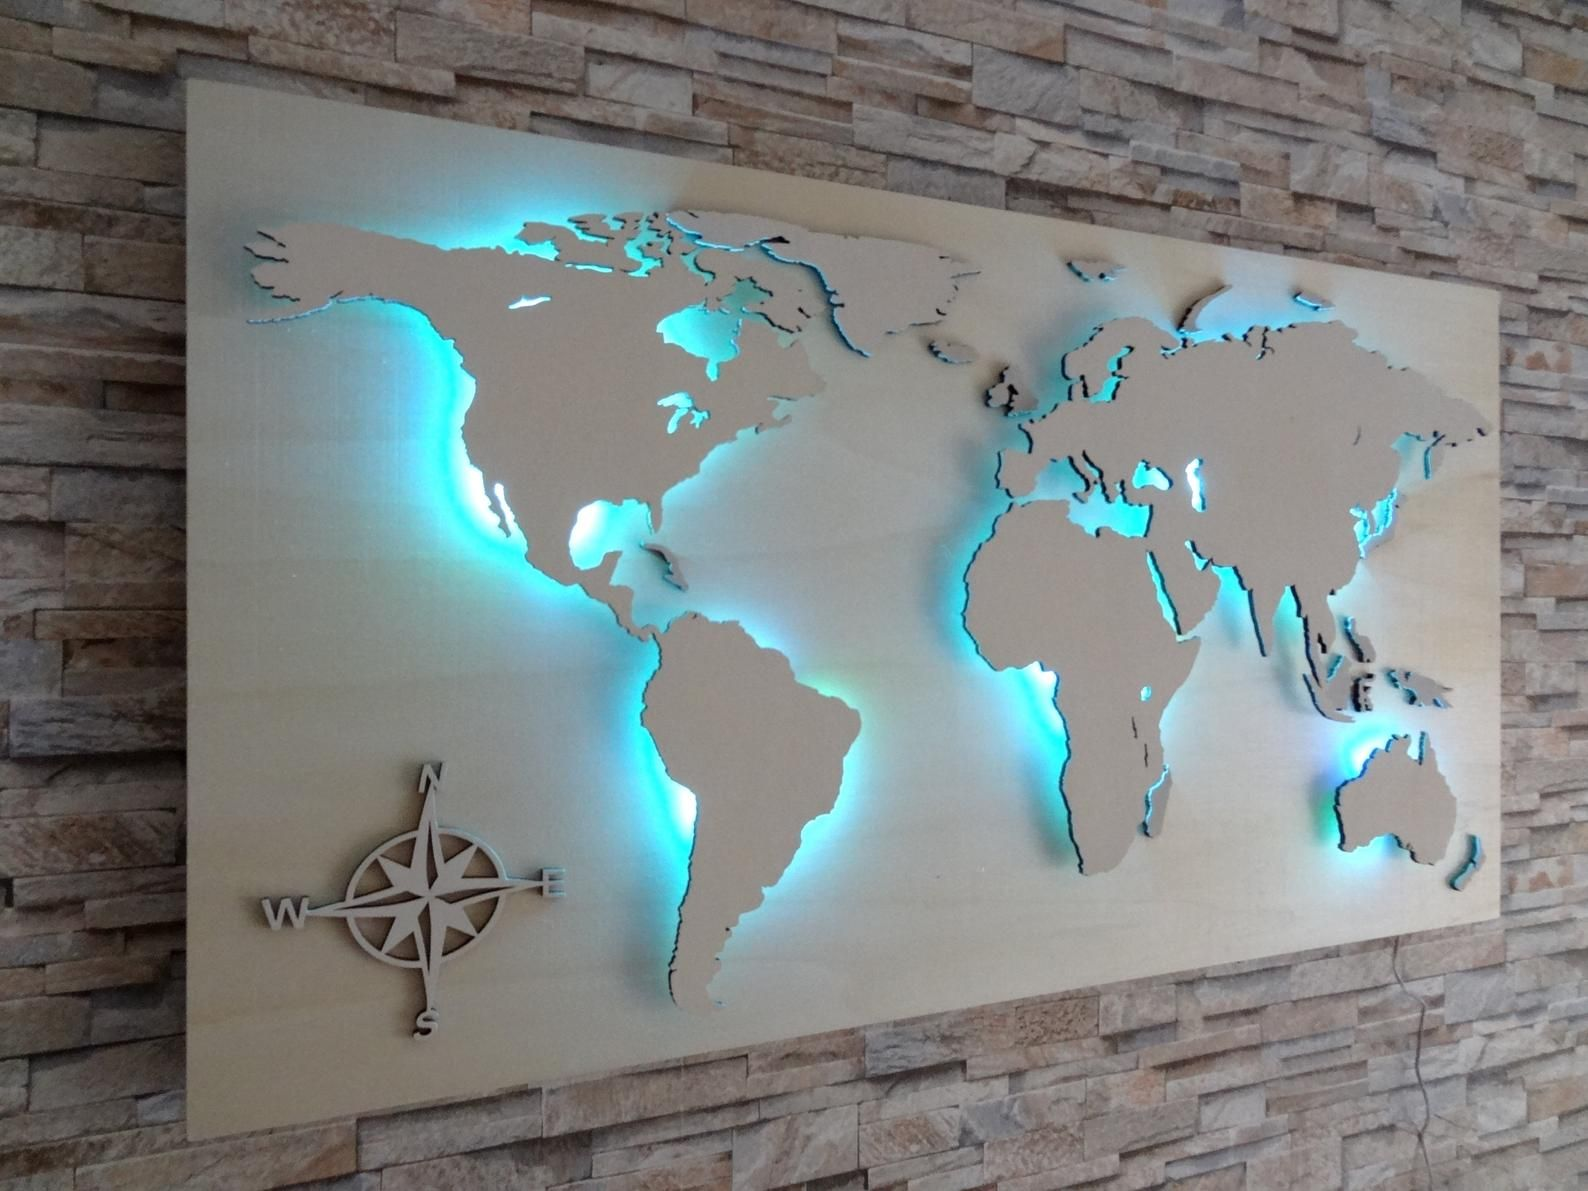 World Map Made Of Wood Led Lighting Stern Decoration In 2020 World Map Decor Map Wall Decor World Map Art